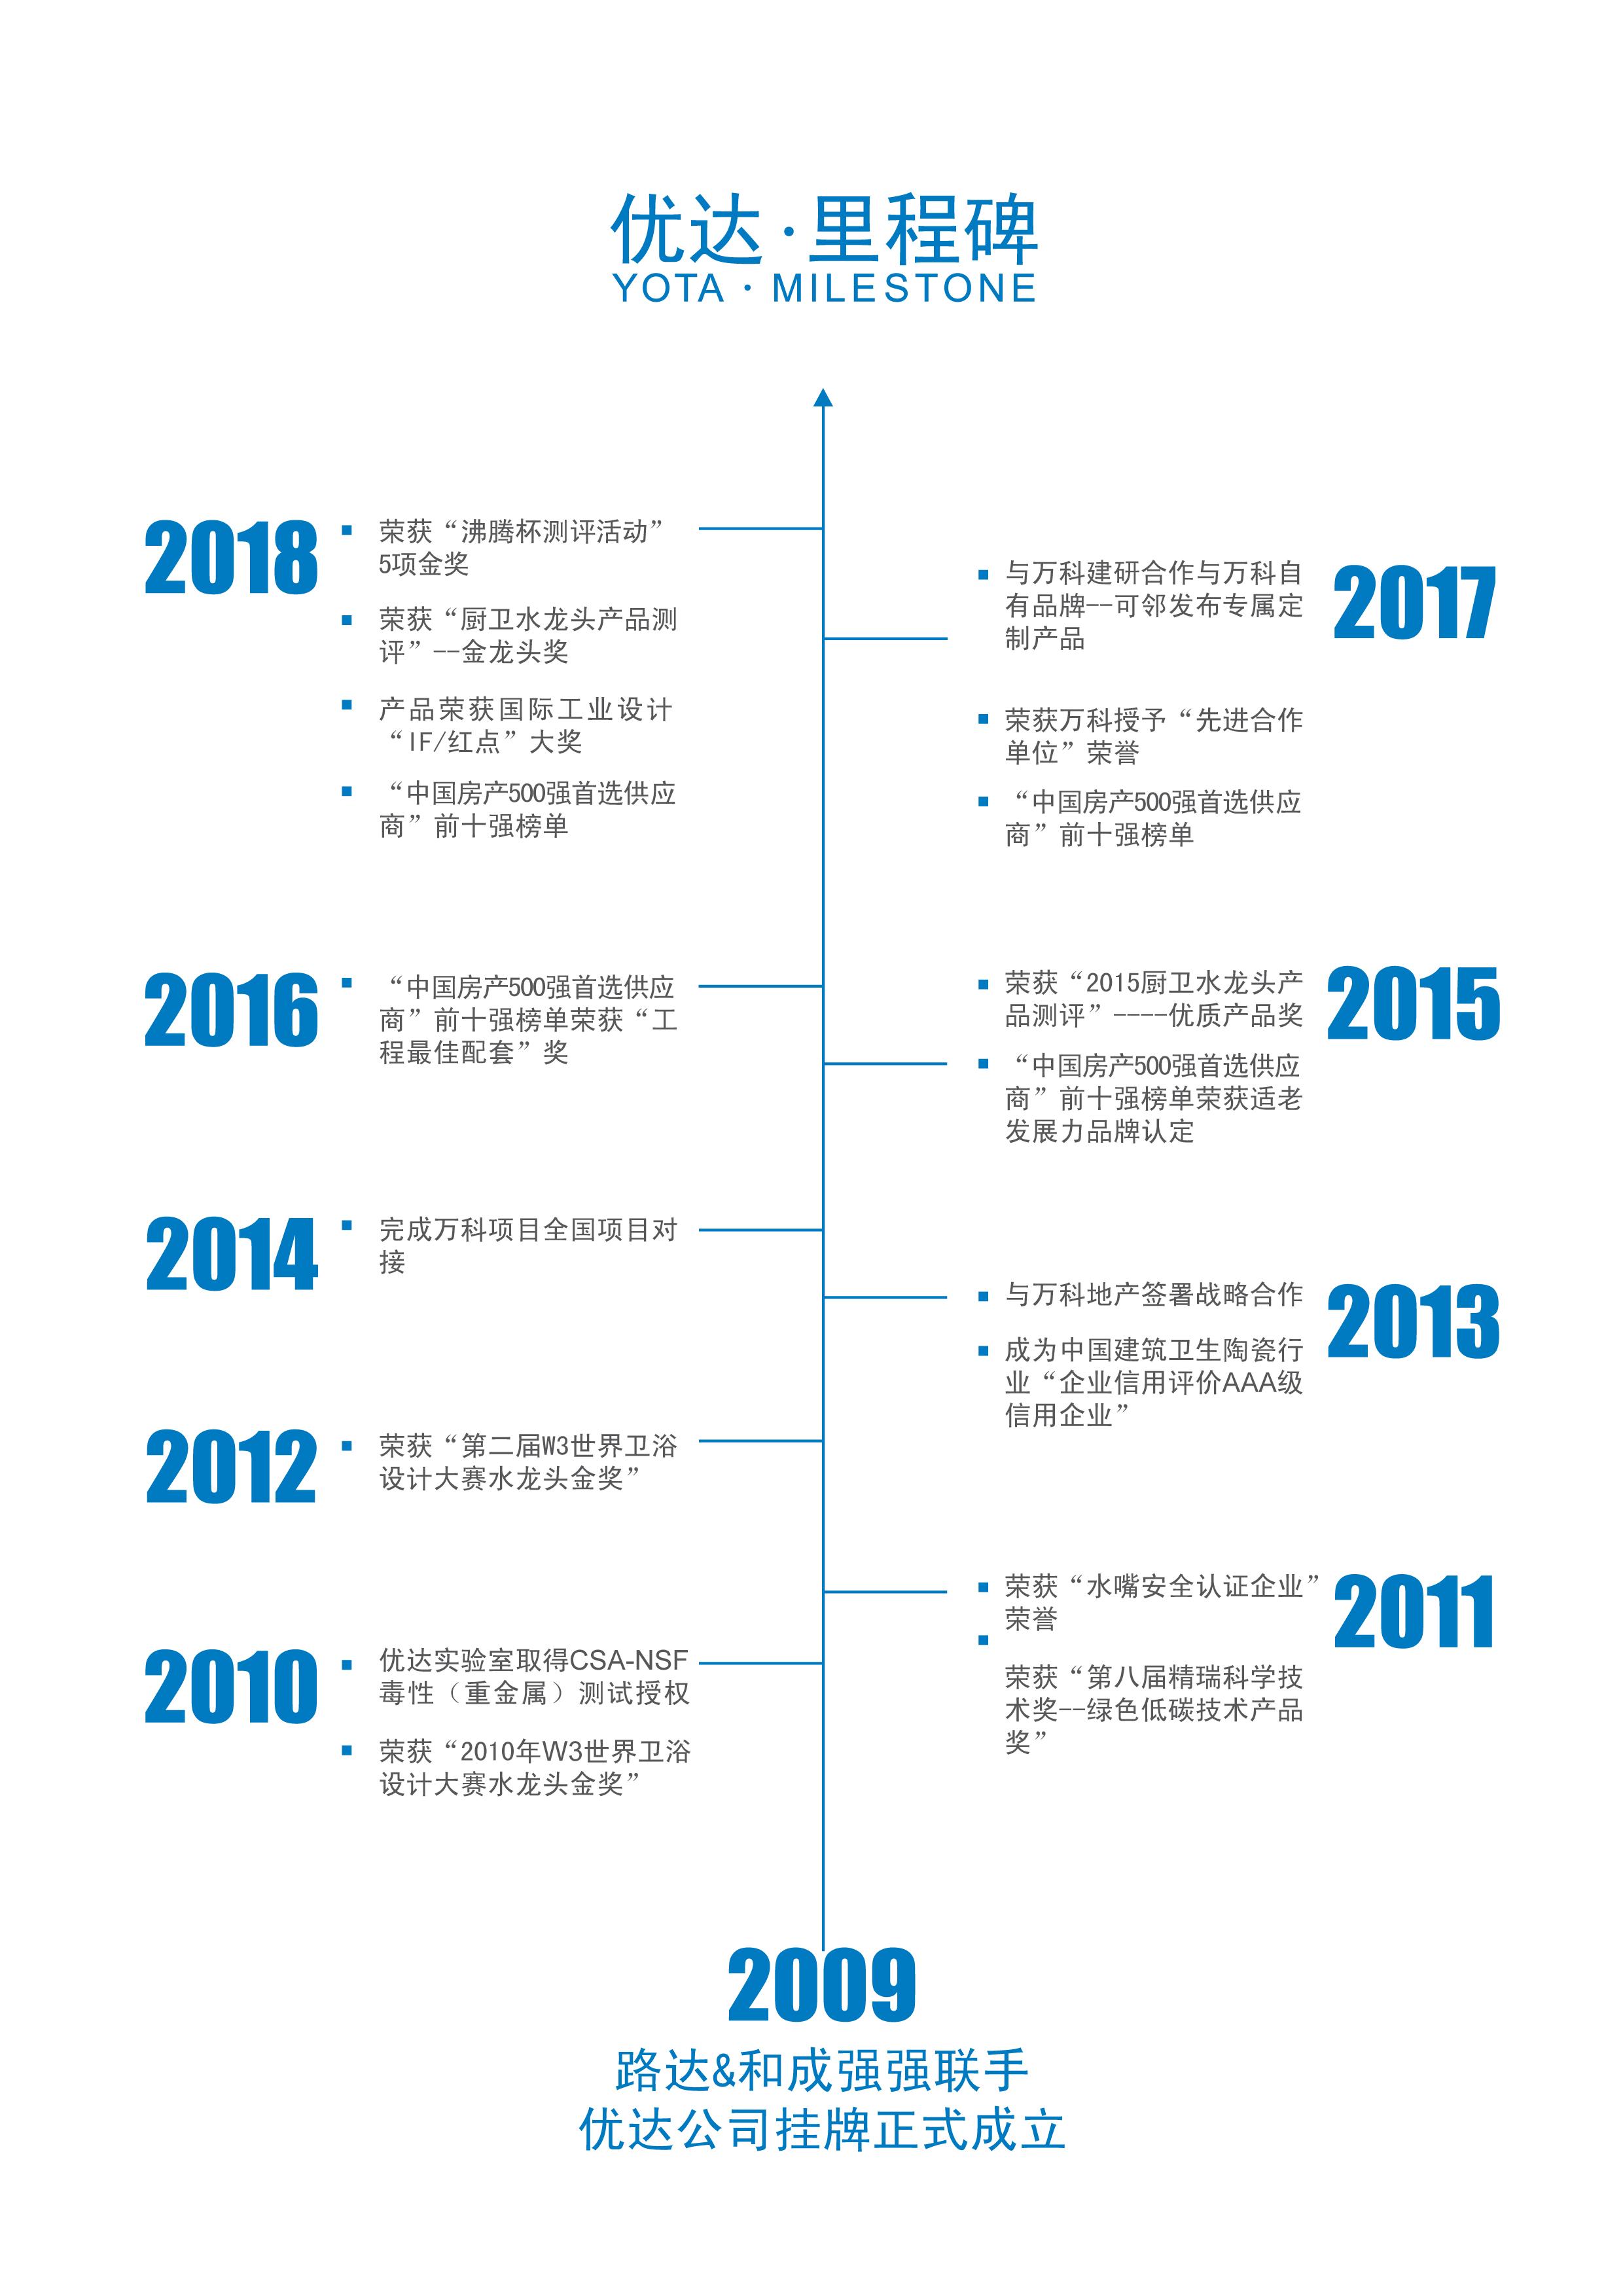 HCG品牌历程-02.jpg